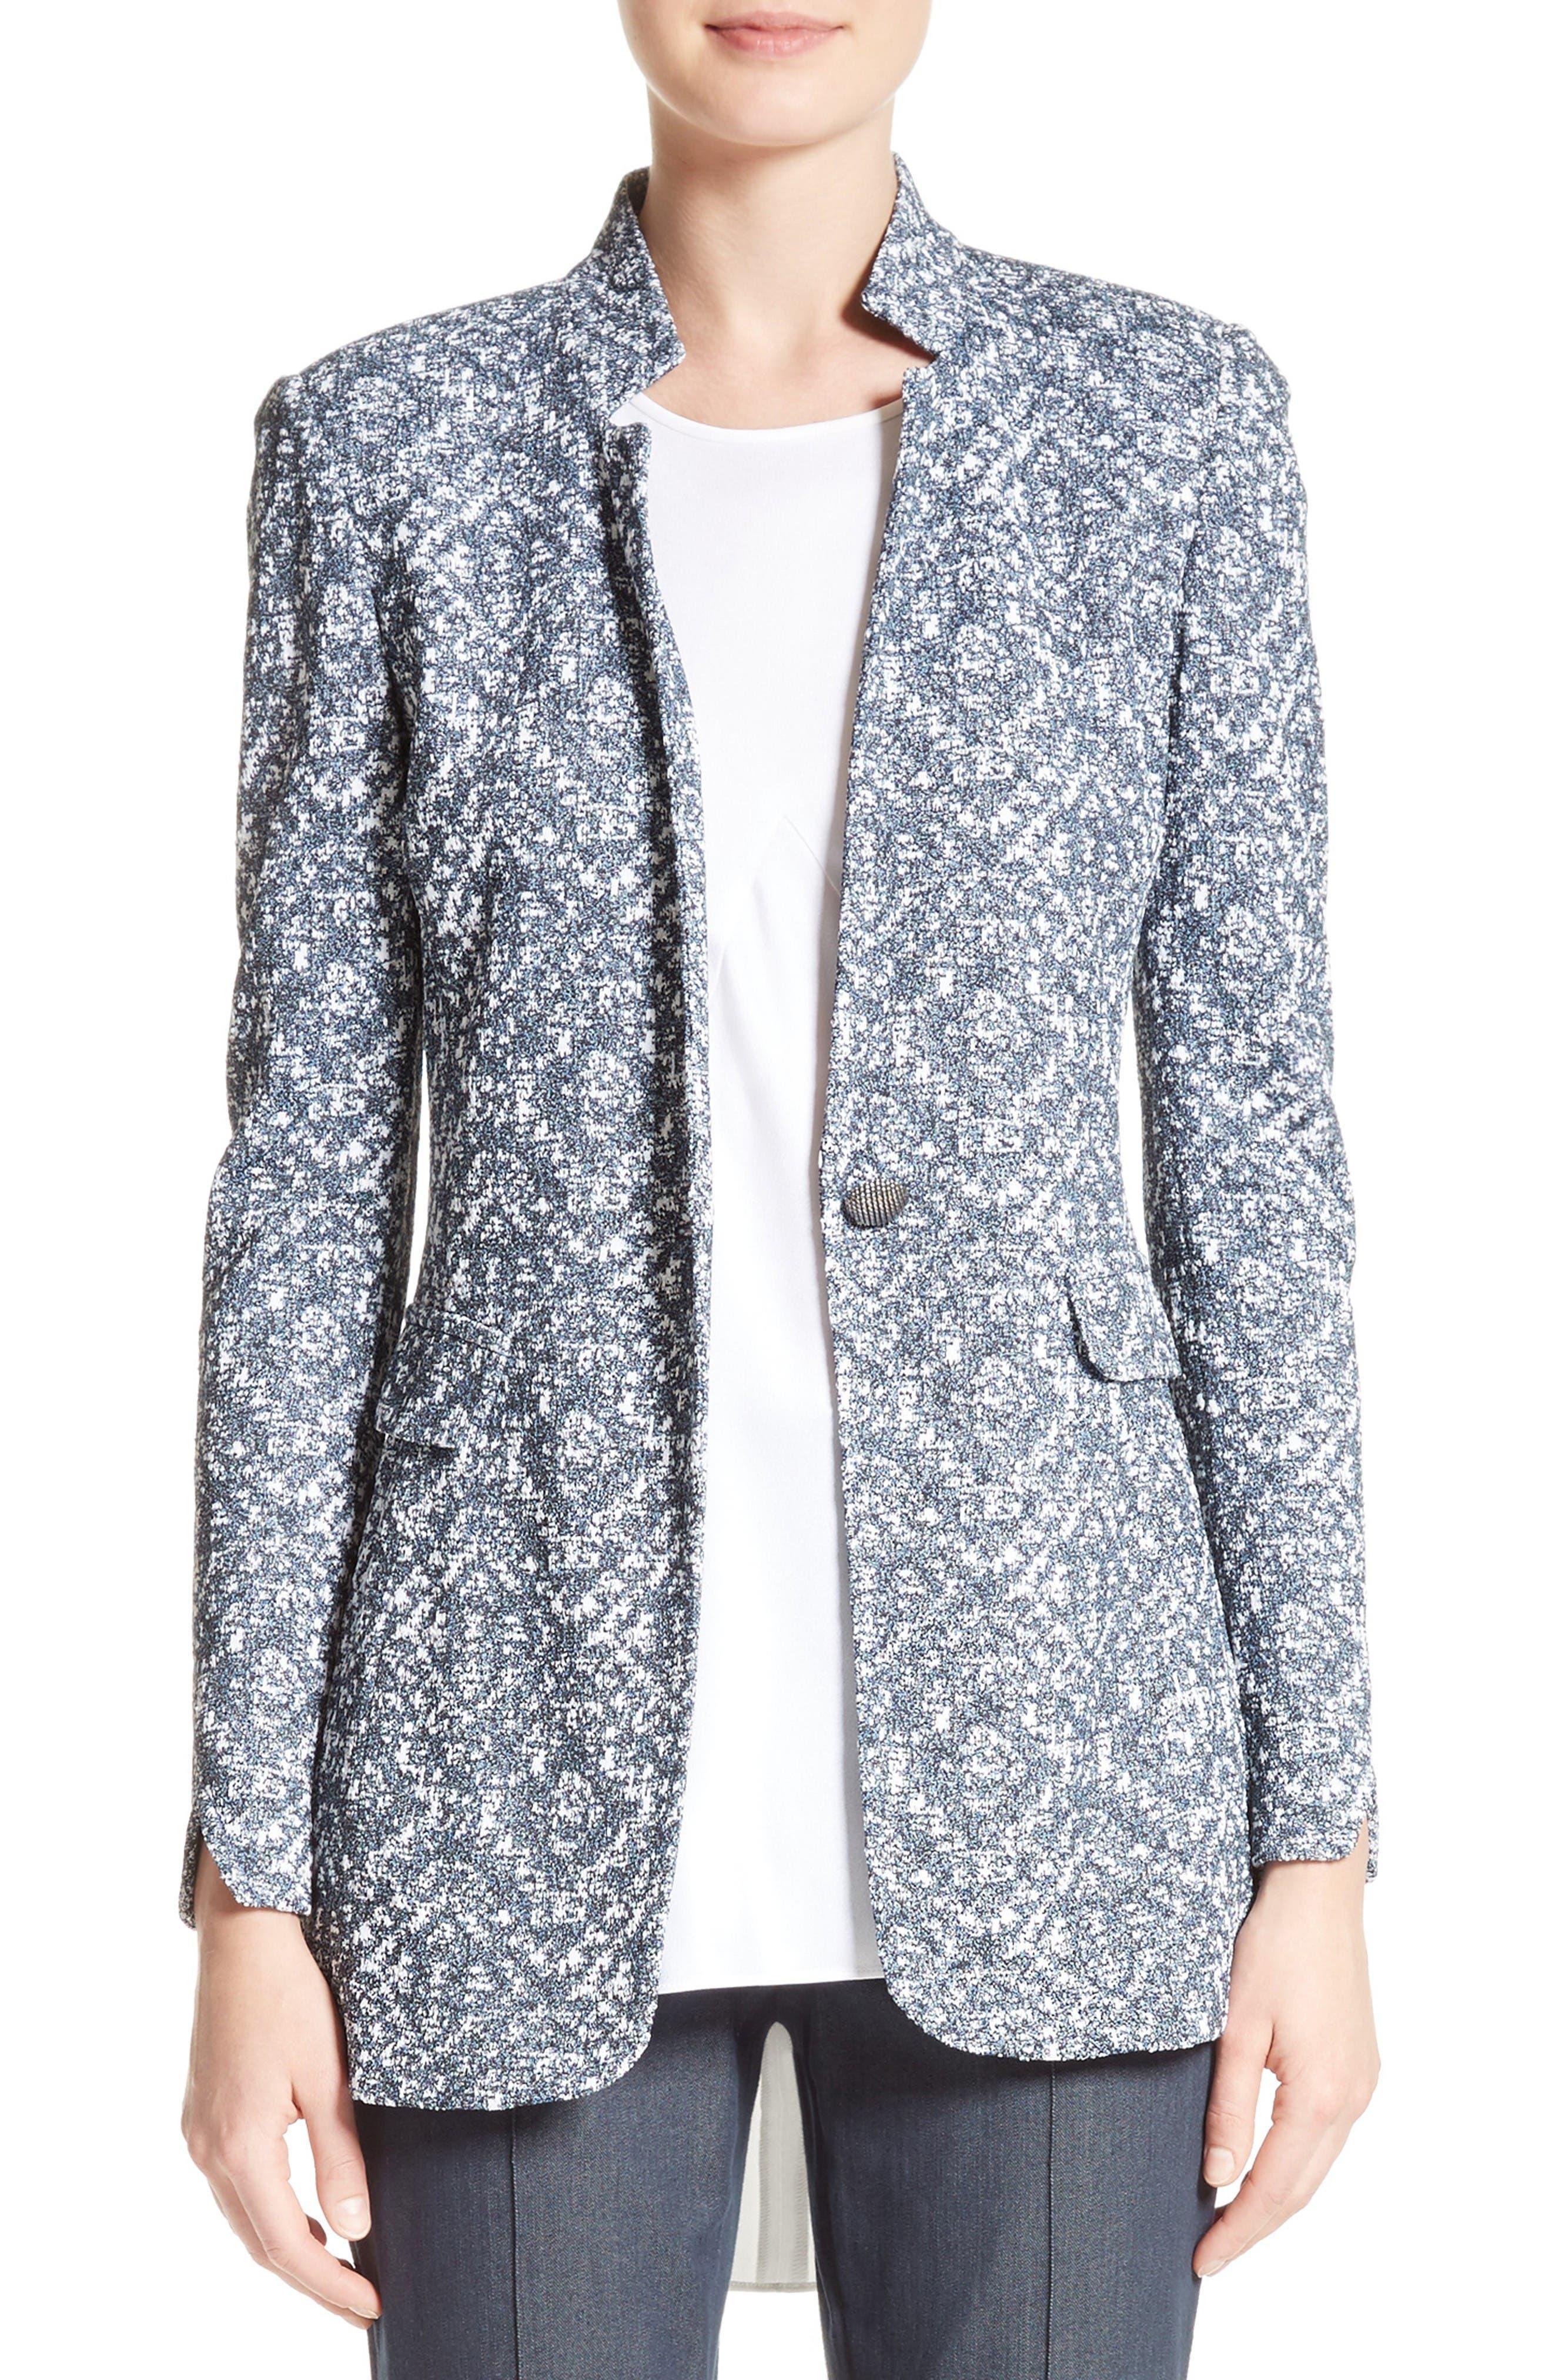 ST. JOHN COLLECTION Devaj Jacquard Knit Jacket